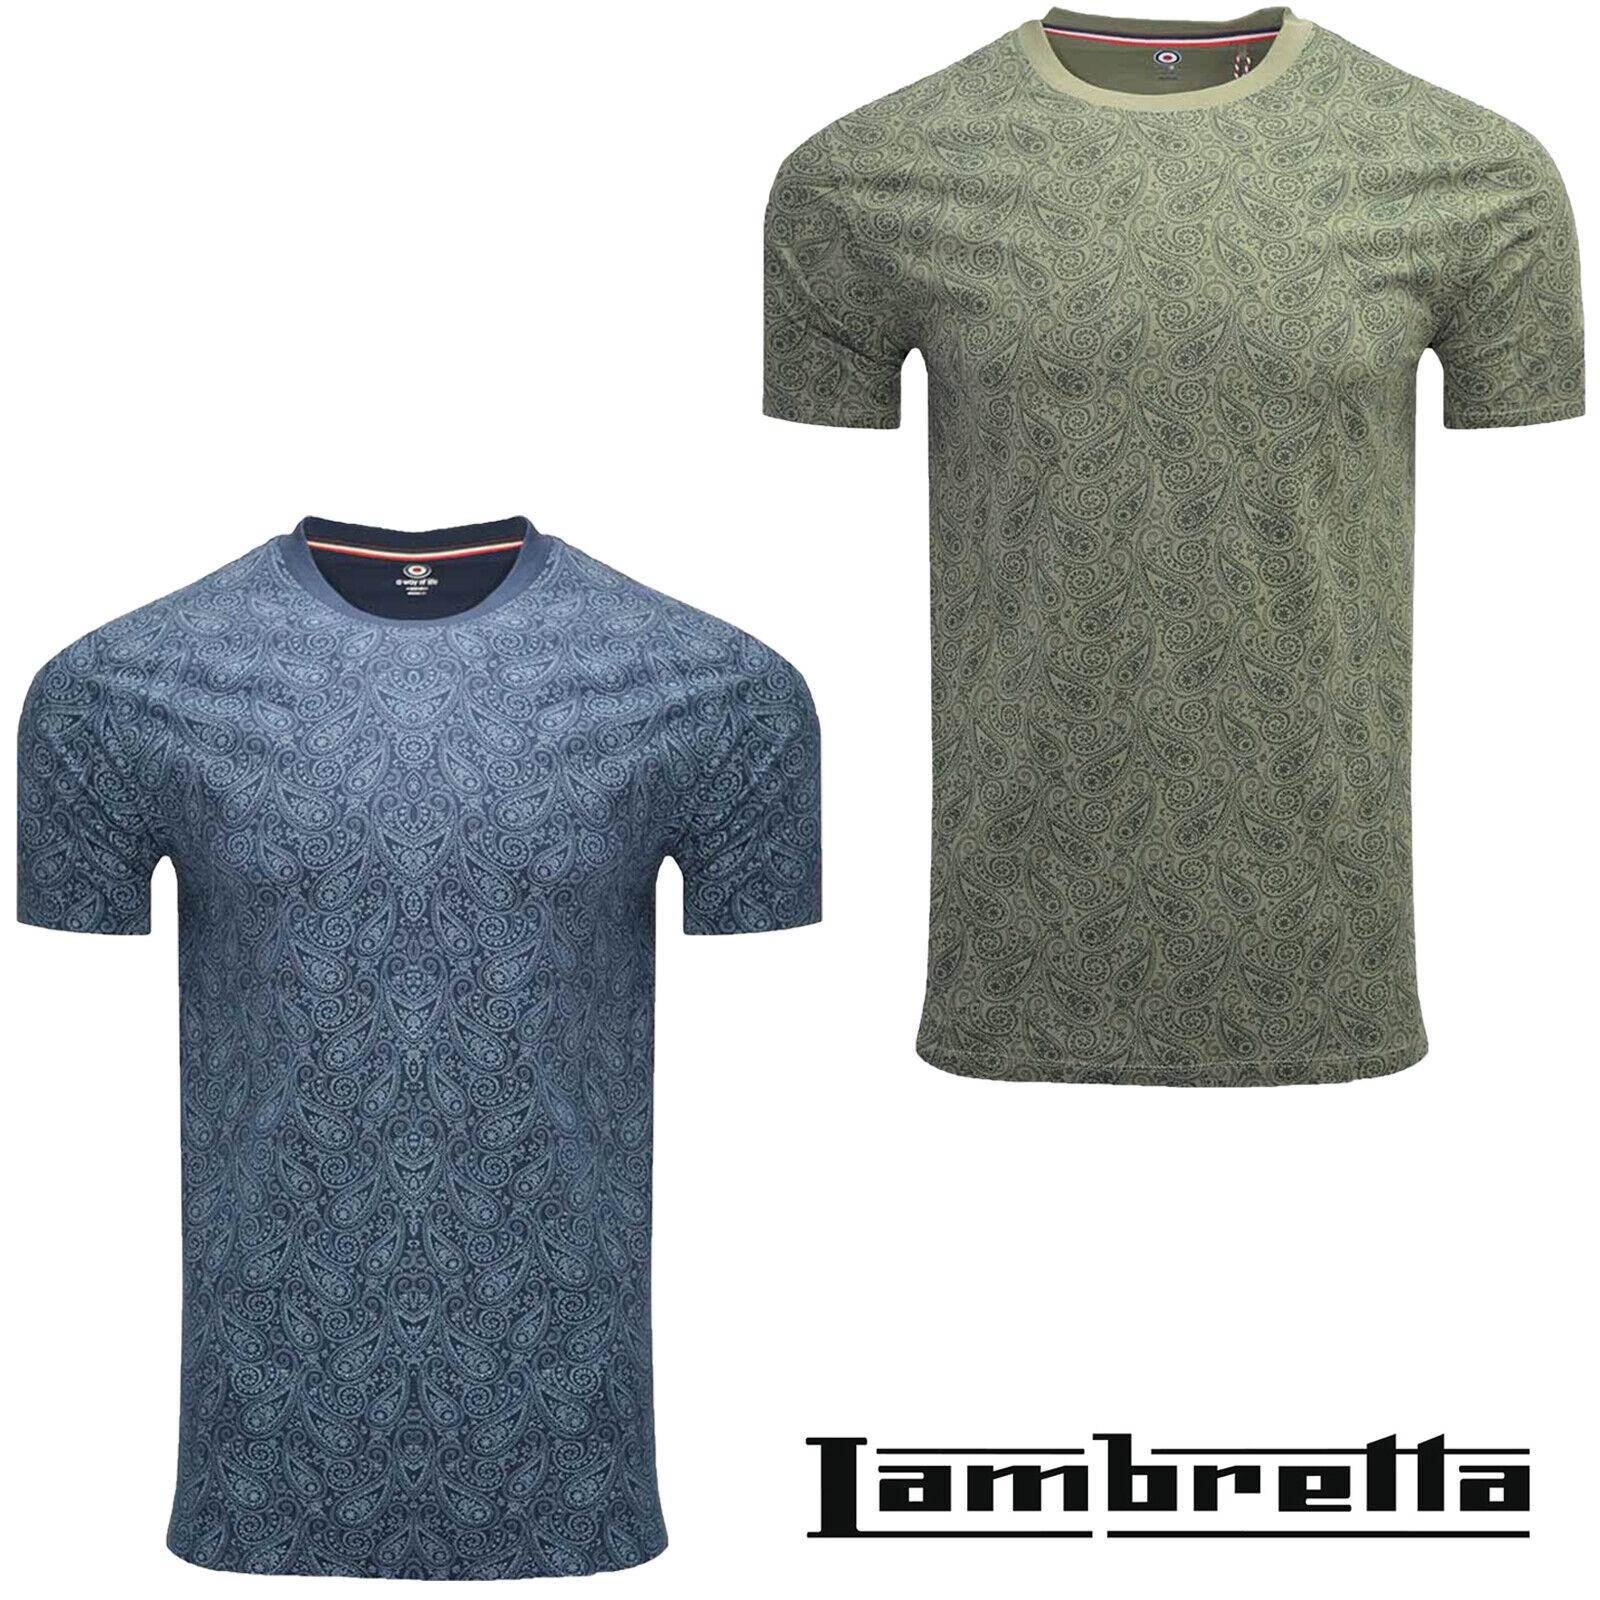 Lambretta Retro T-Shirts Print Scooter Short Sleeve MOD Mens Cotton UK S-4XL